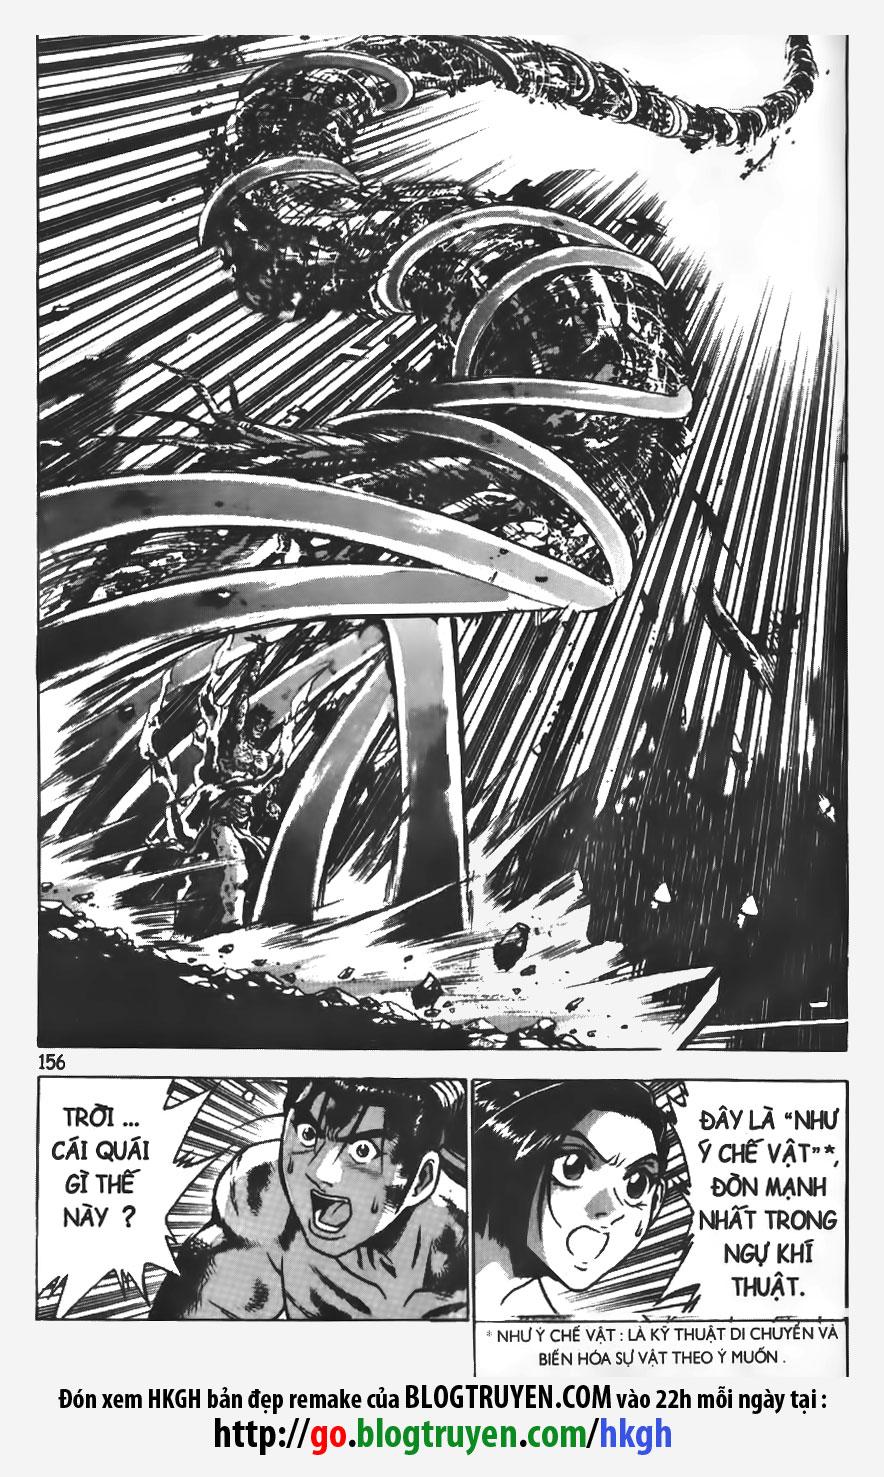 xem truyen moi - Hiệp Khách Giang Hồ - Hiệp Khách Giang Hồ Chap 158